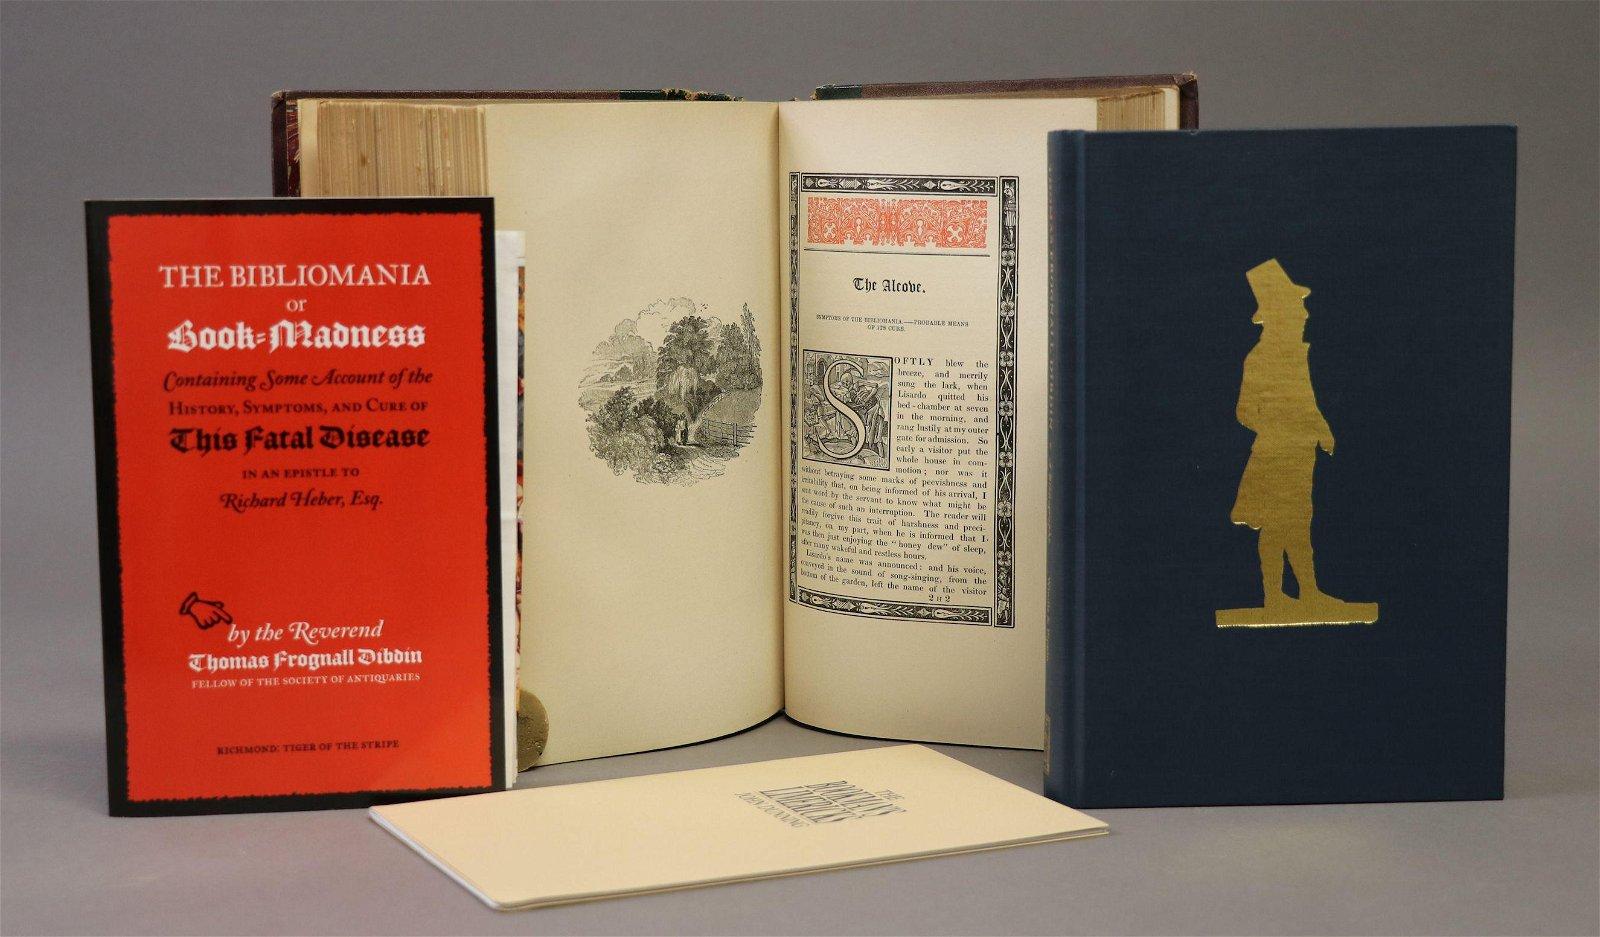 [Books on Books] Bibliomania